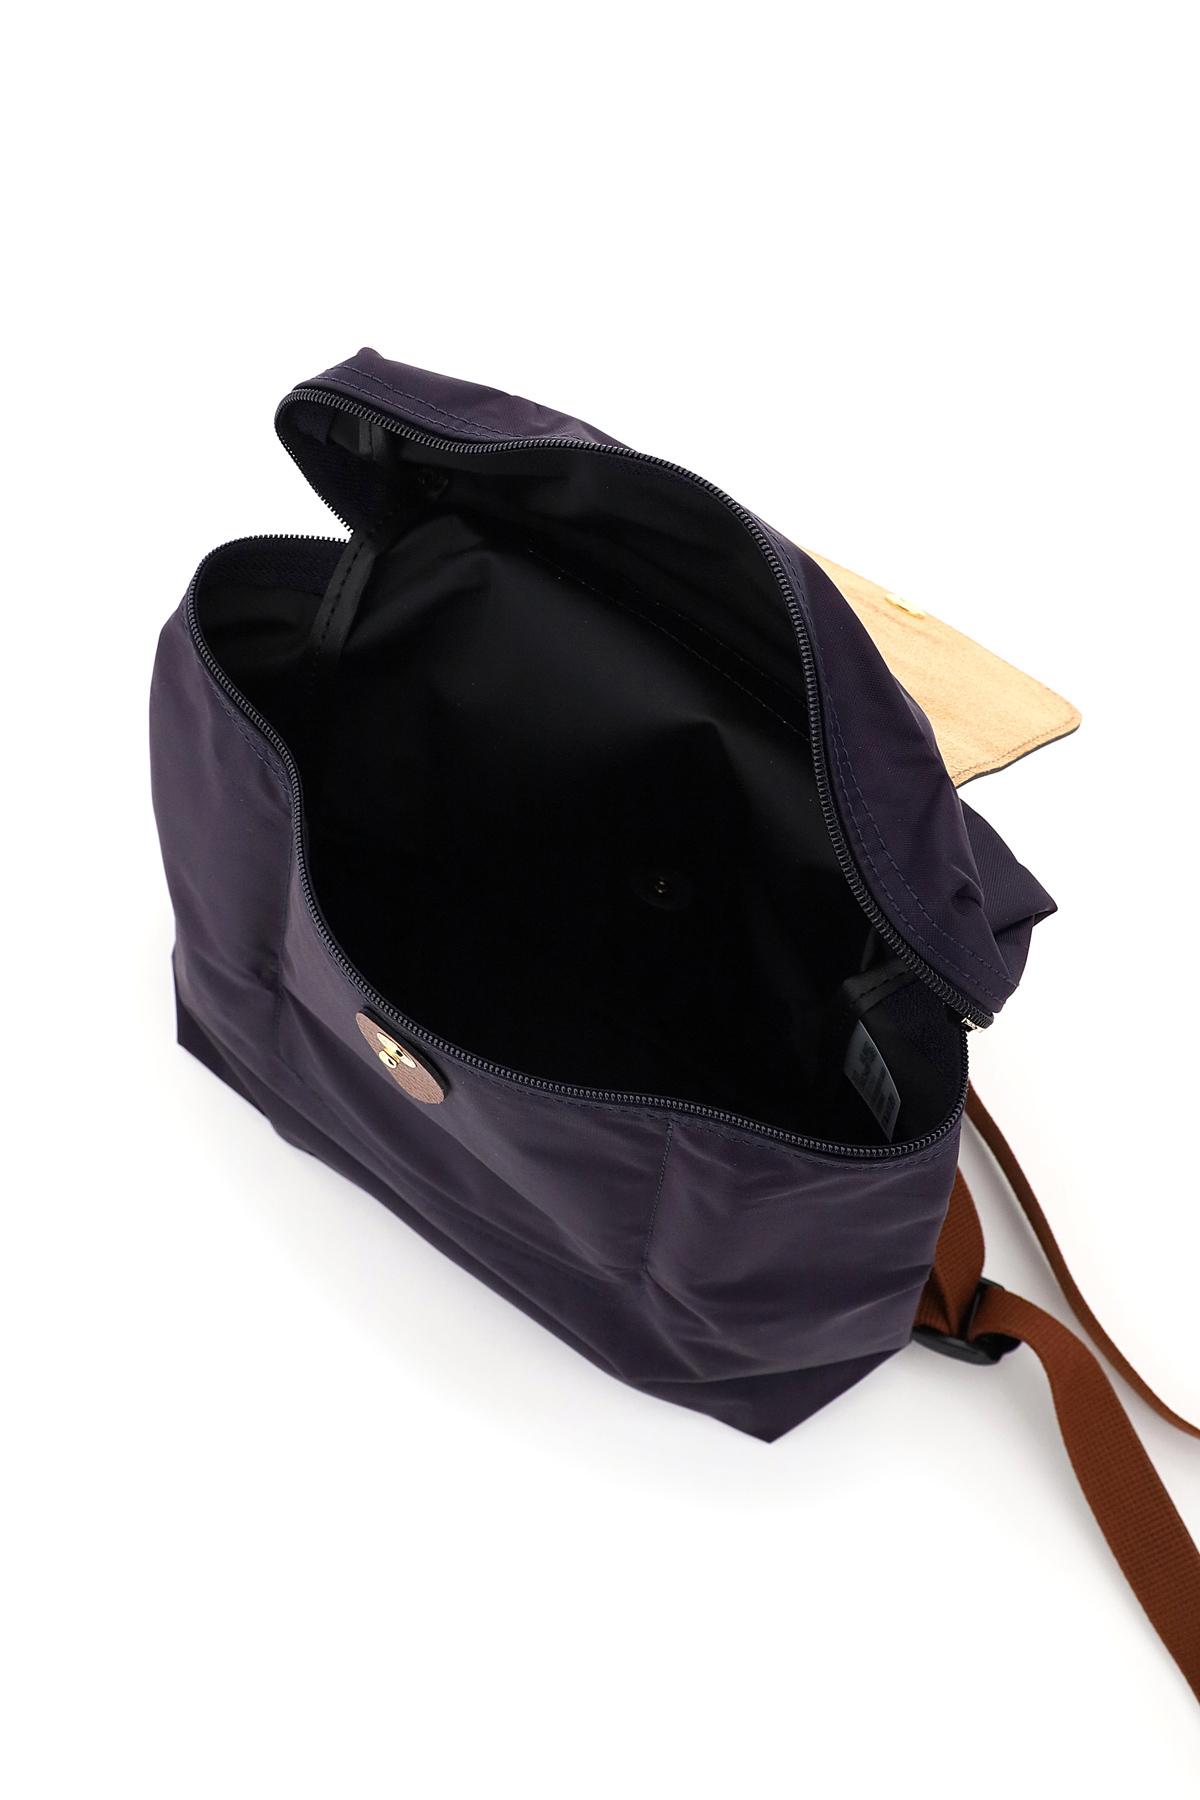 Longchamp zaino le pliage original nylon e pelle